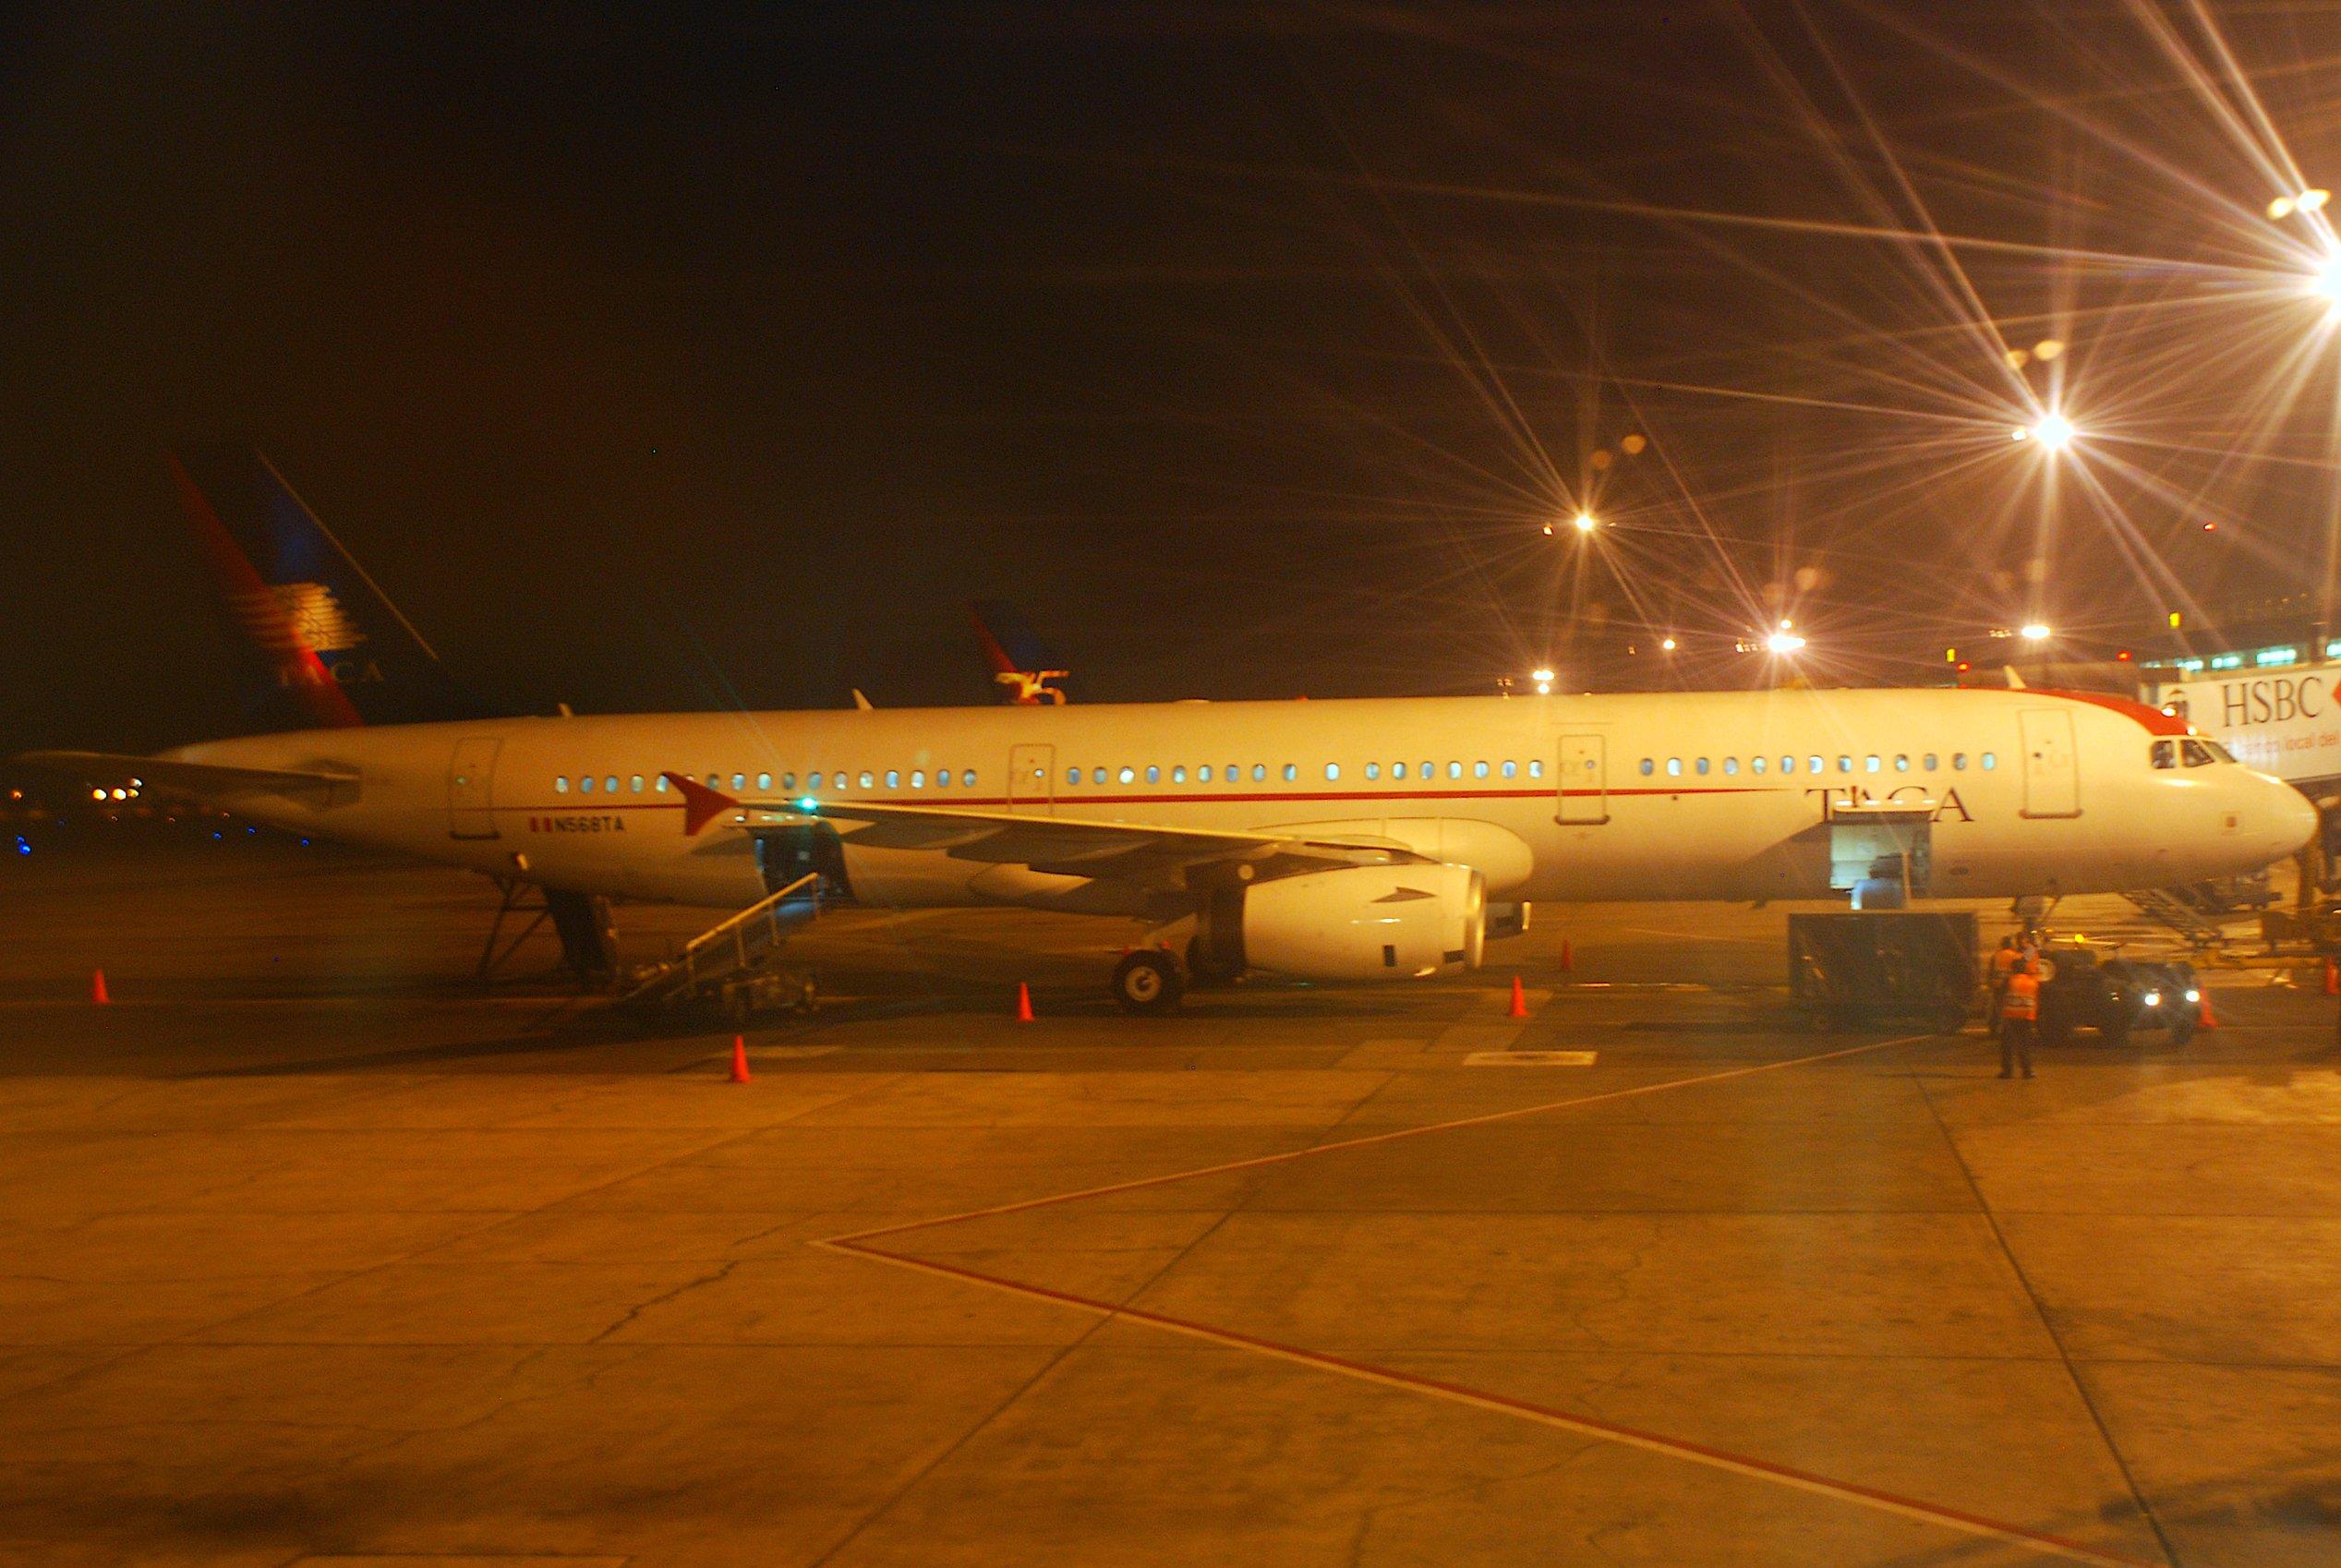 File:TACA Airbus A321-231, N568TA@LIM,30 06 2008-519ao